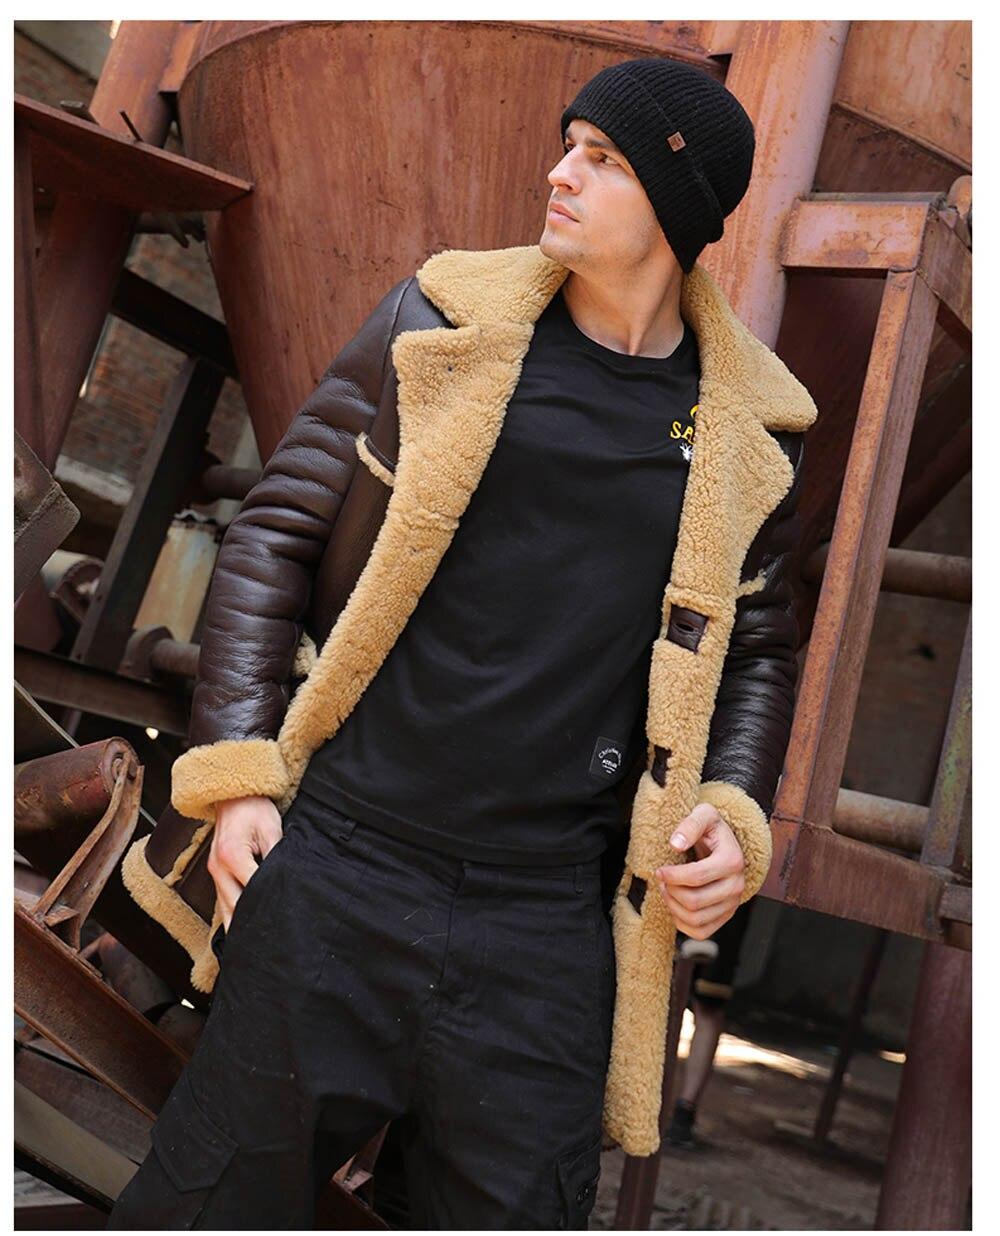 H753af611f7a74569a3ab6c1cd3e6a804G Men Luxury Fur Shearling Coat Yellow Soft Thicken Fur Coat Winter Male Formal Business Fur Sheepskin Jackets